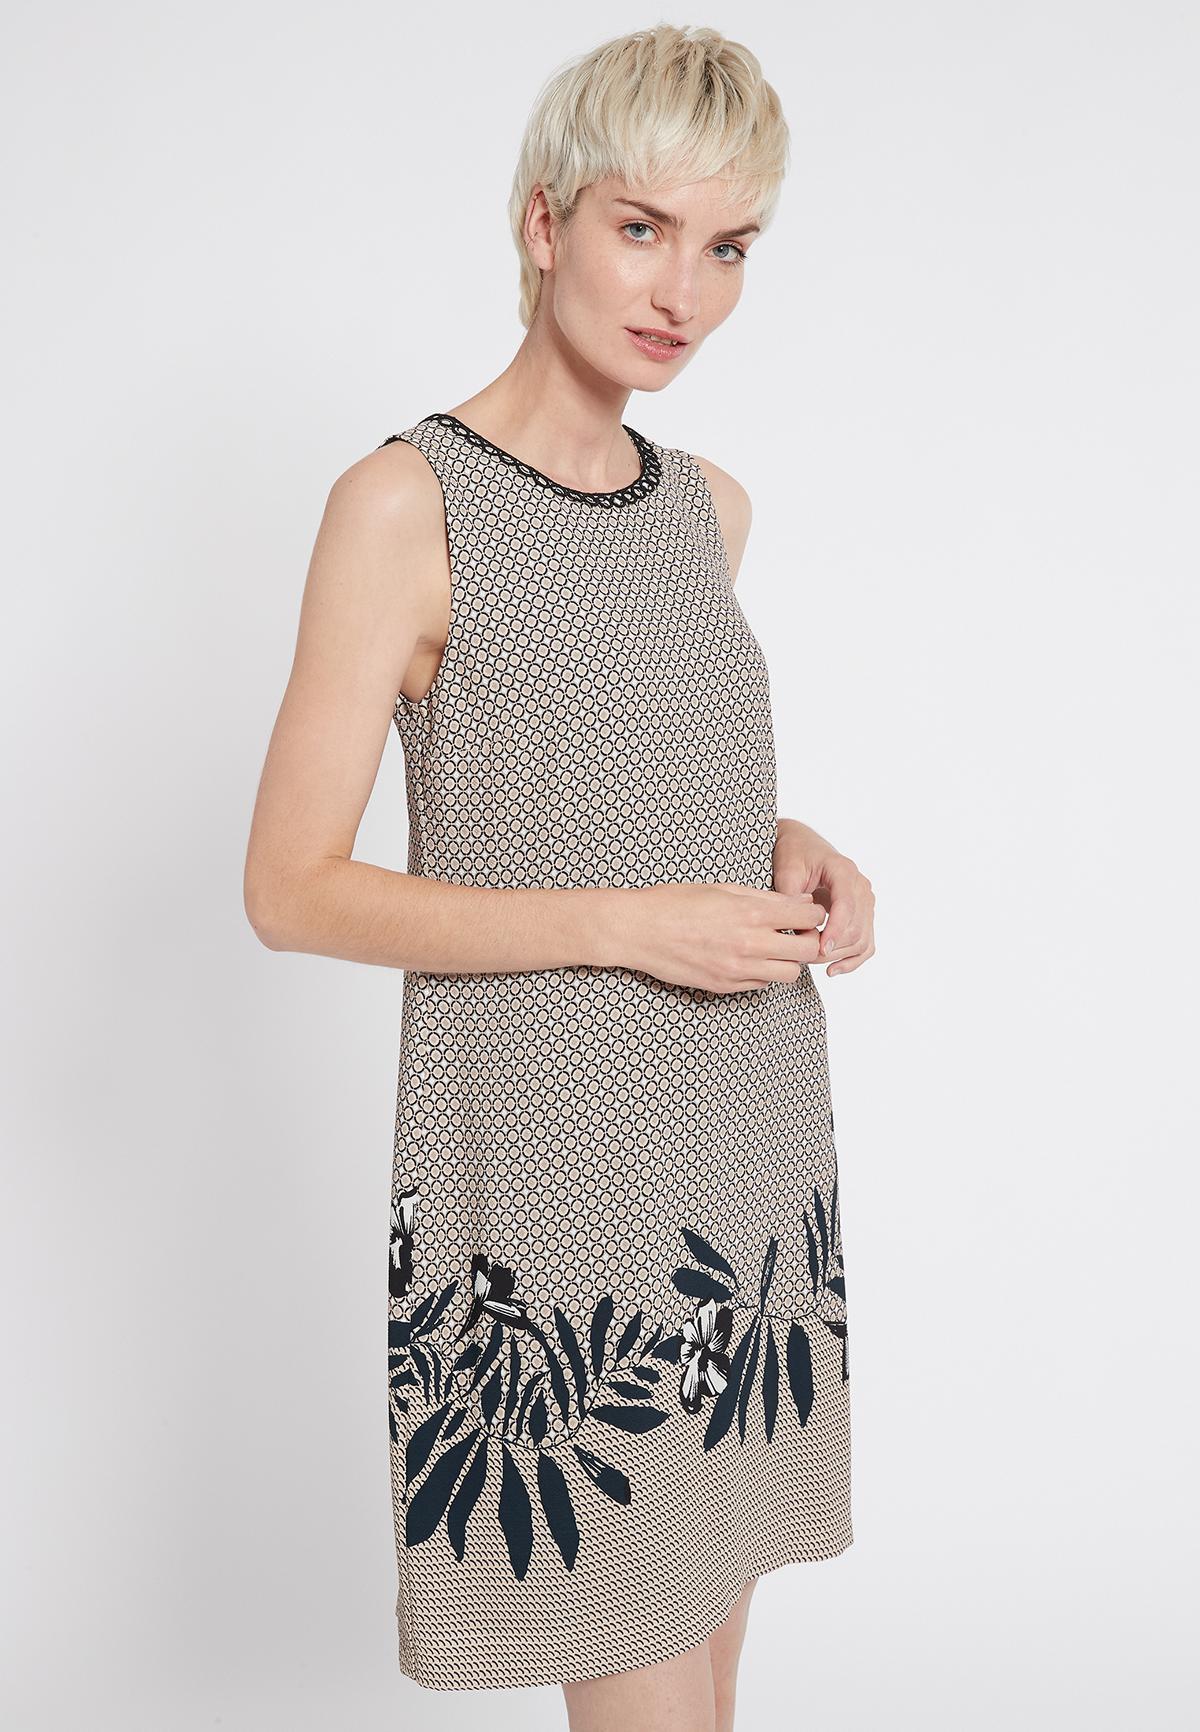 Front of Ana Alcazar Sleeveless Dress Sedoni  worn by model